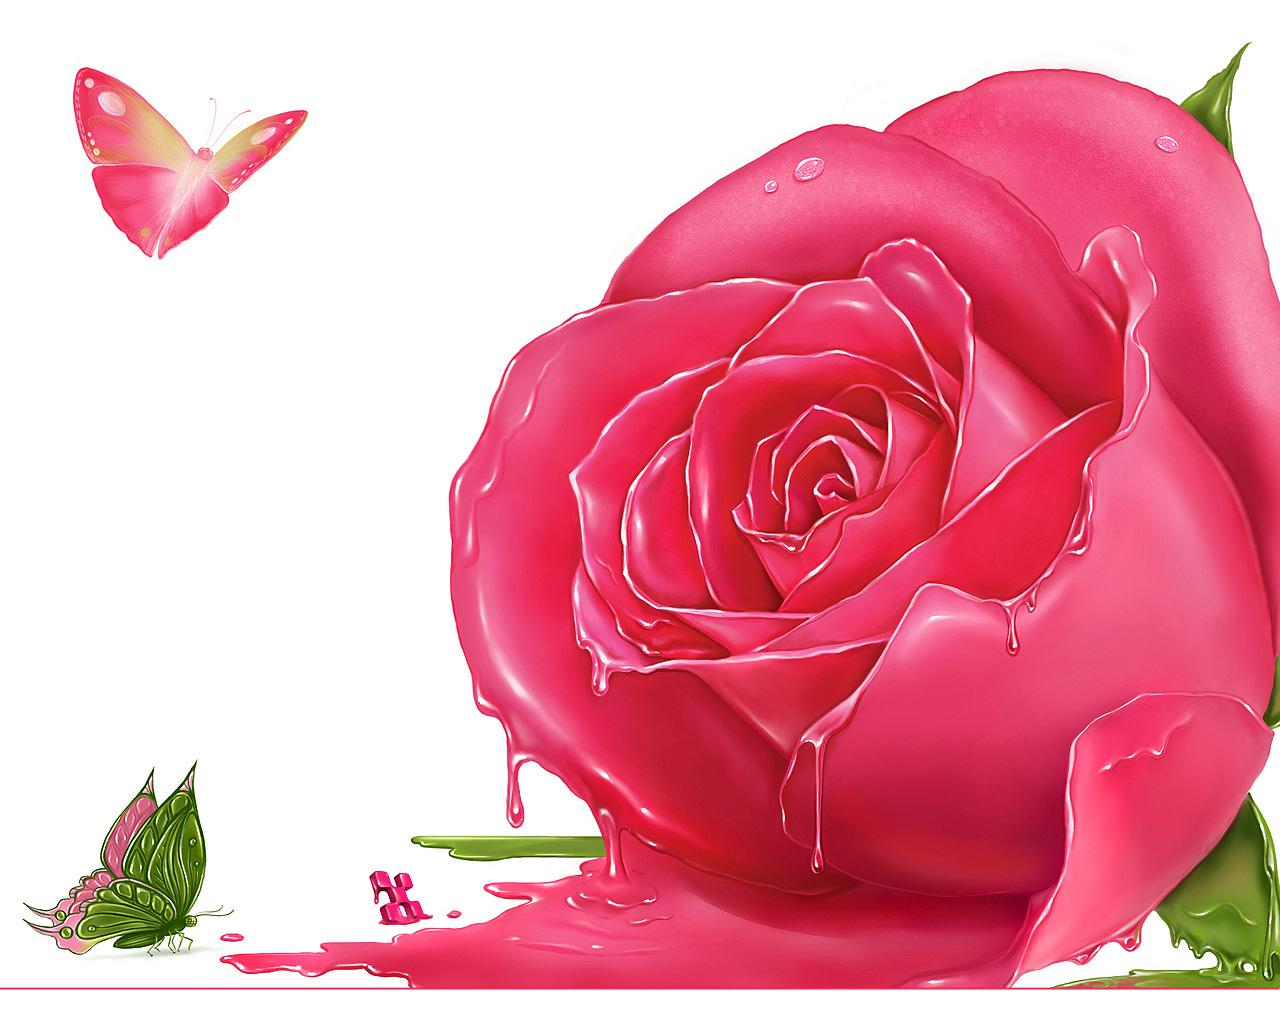 Beautiful rose hd wallpapers flowers - Pink rose hd wallpaper ...